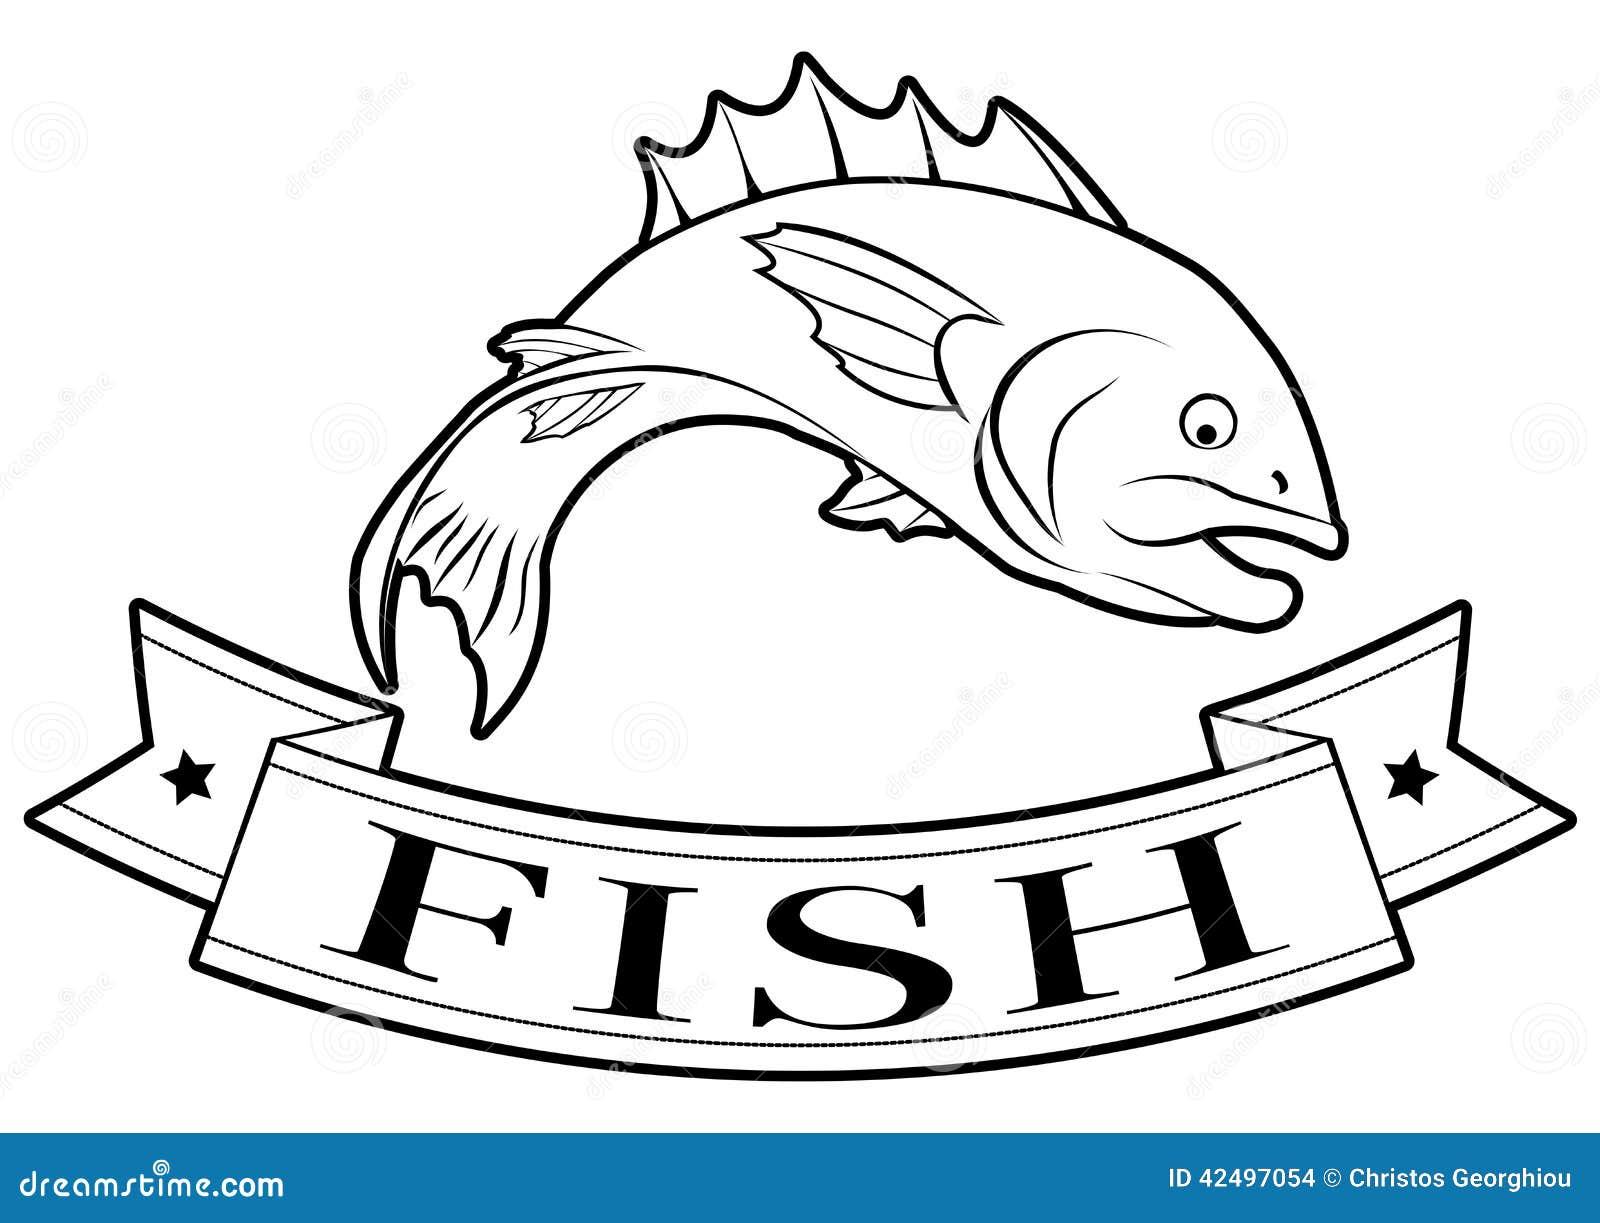 fish label - Redbul.energystandardinternational.co